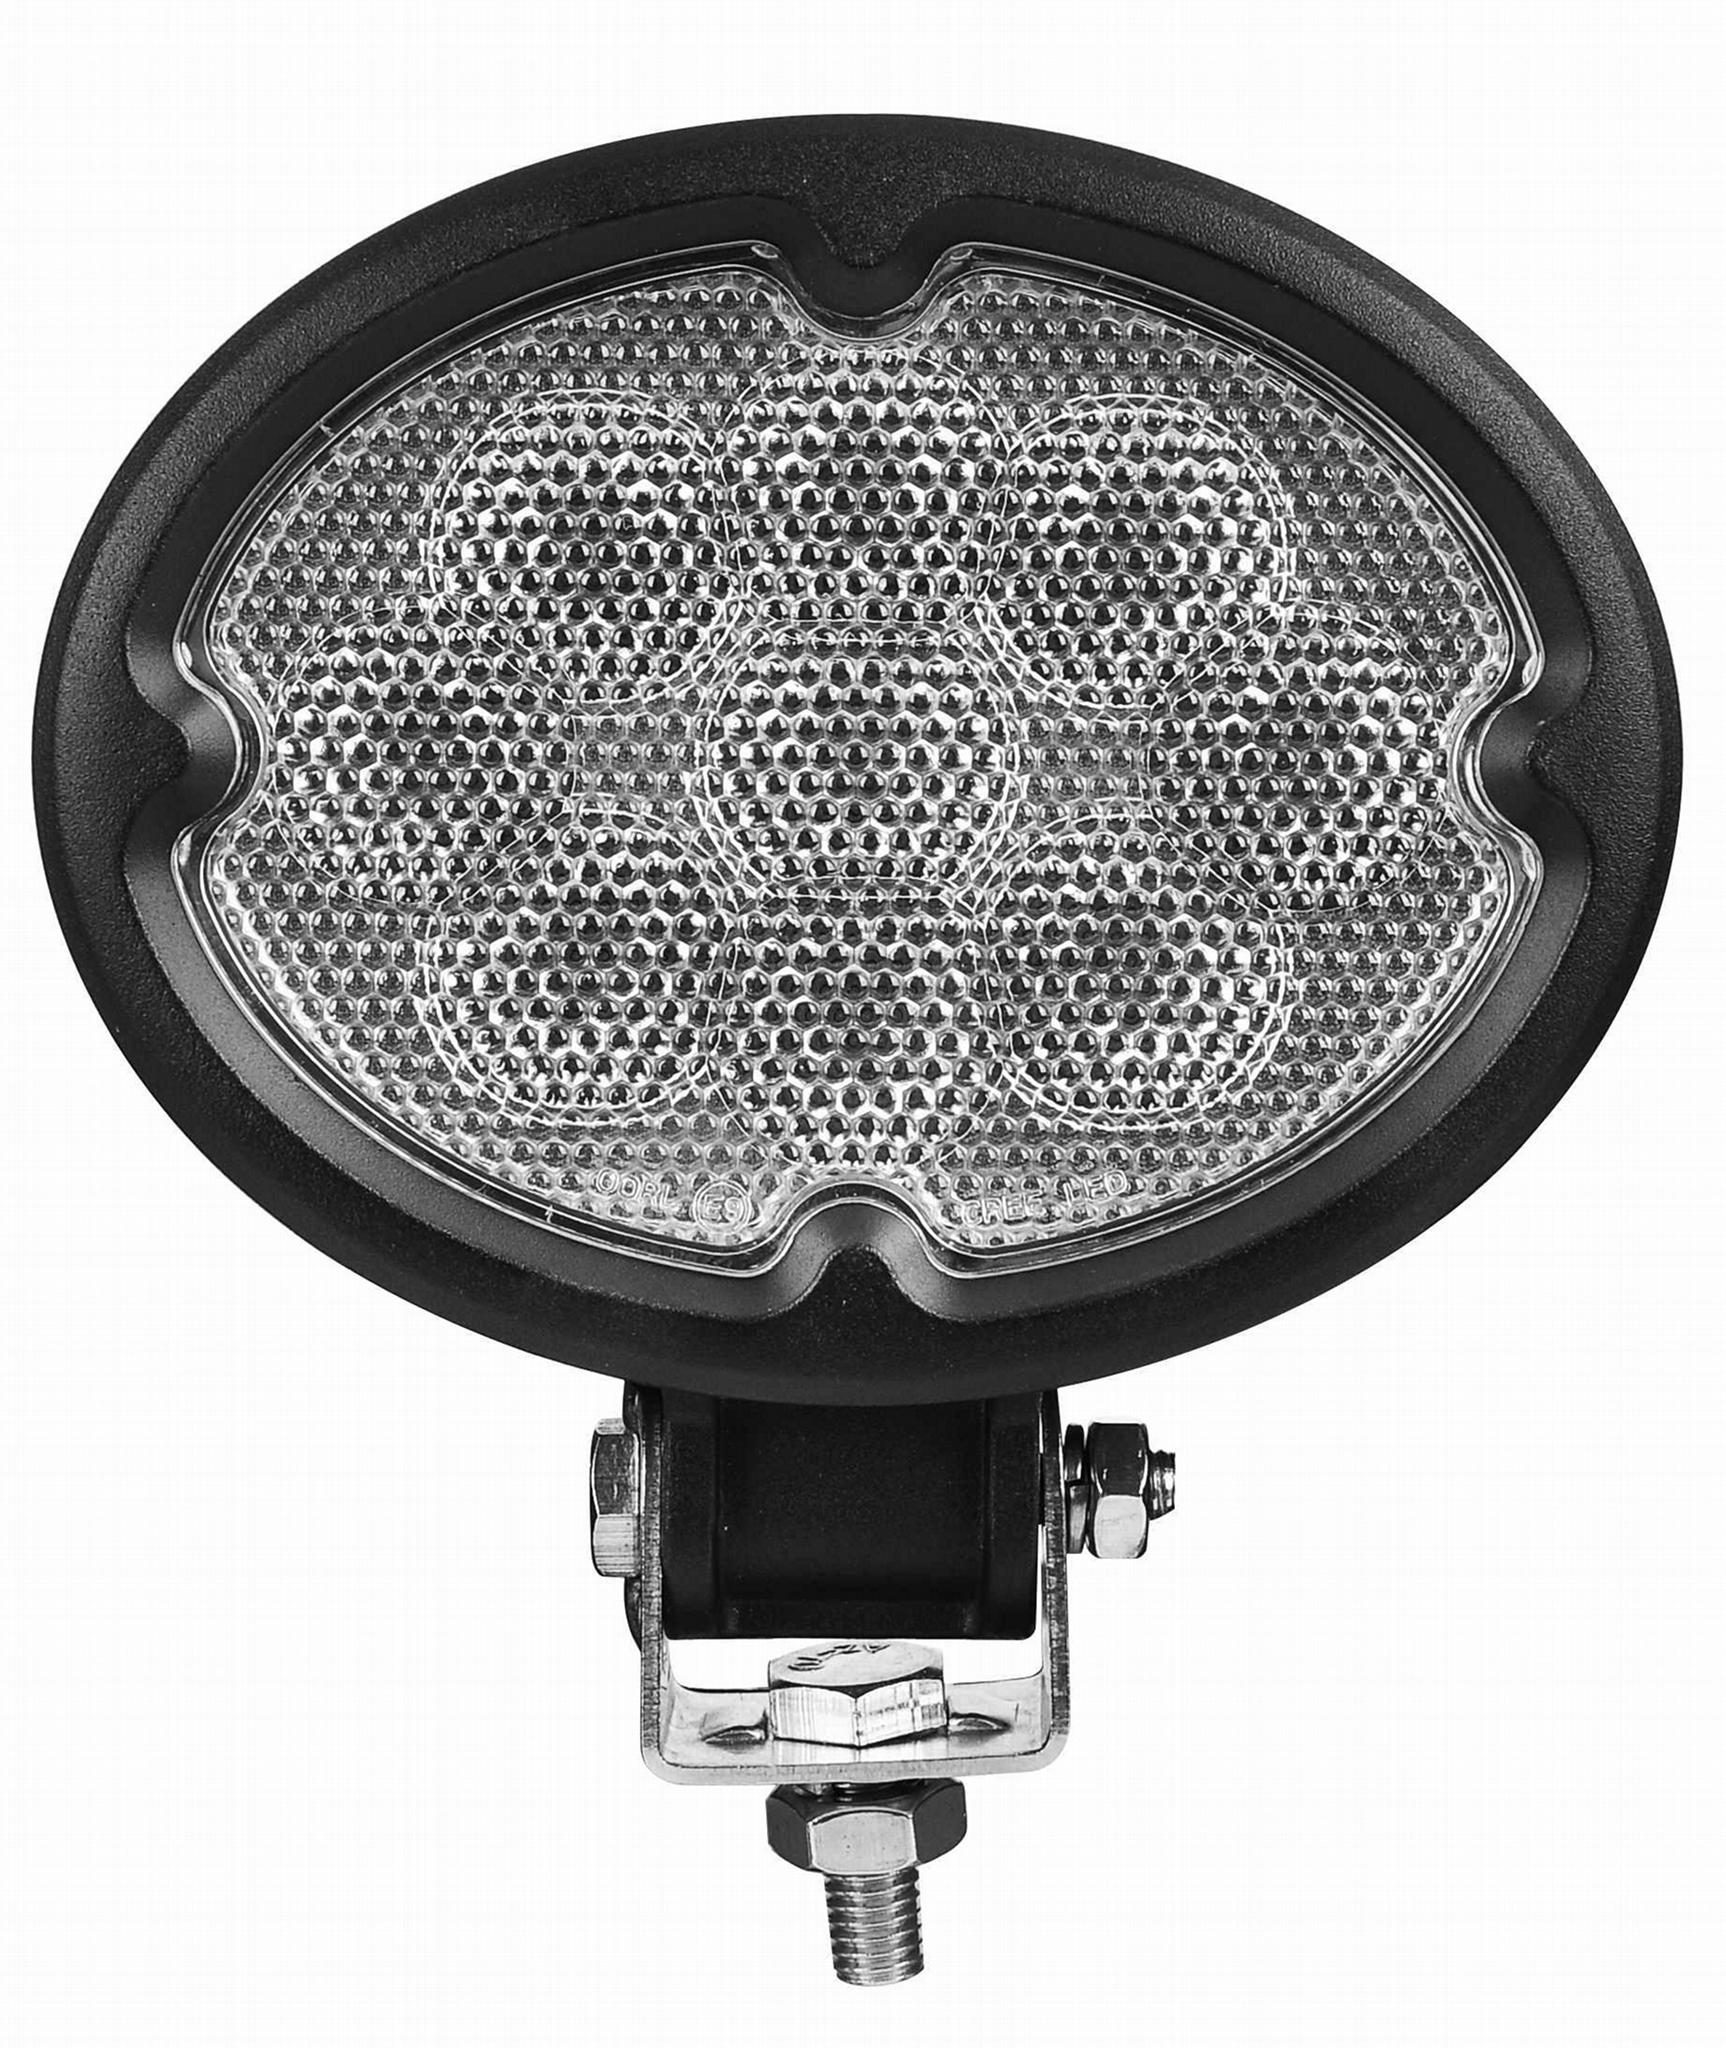 "5.8"" 27W CREE 椭圆形 LED 工作灯泛光灯沙滩灯越野灯驾驶灯 1"